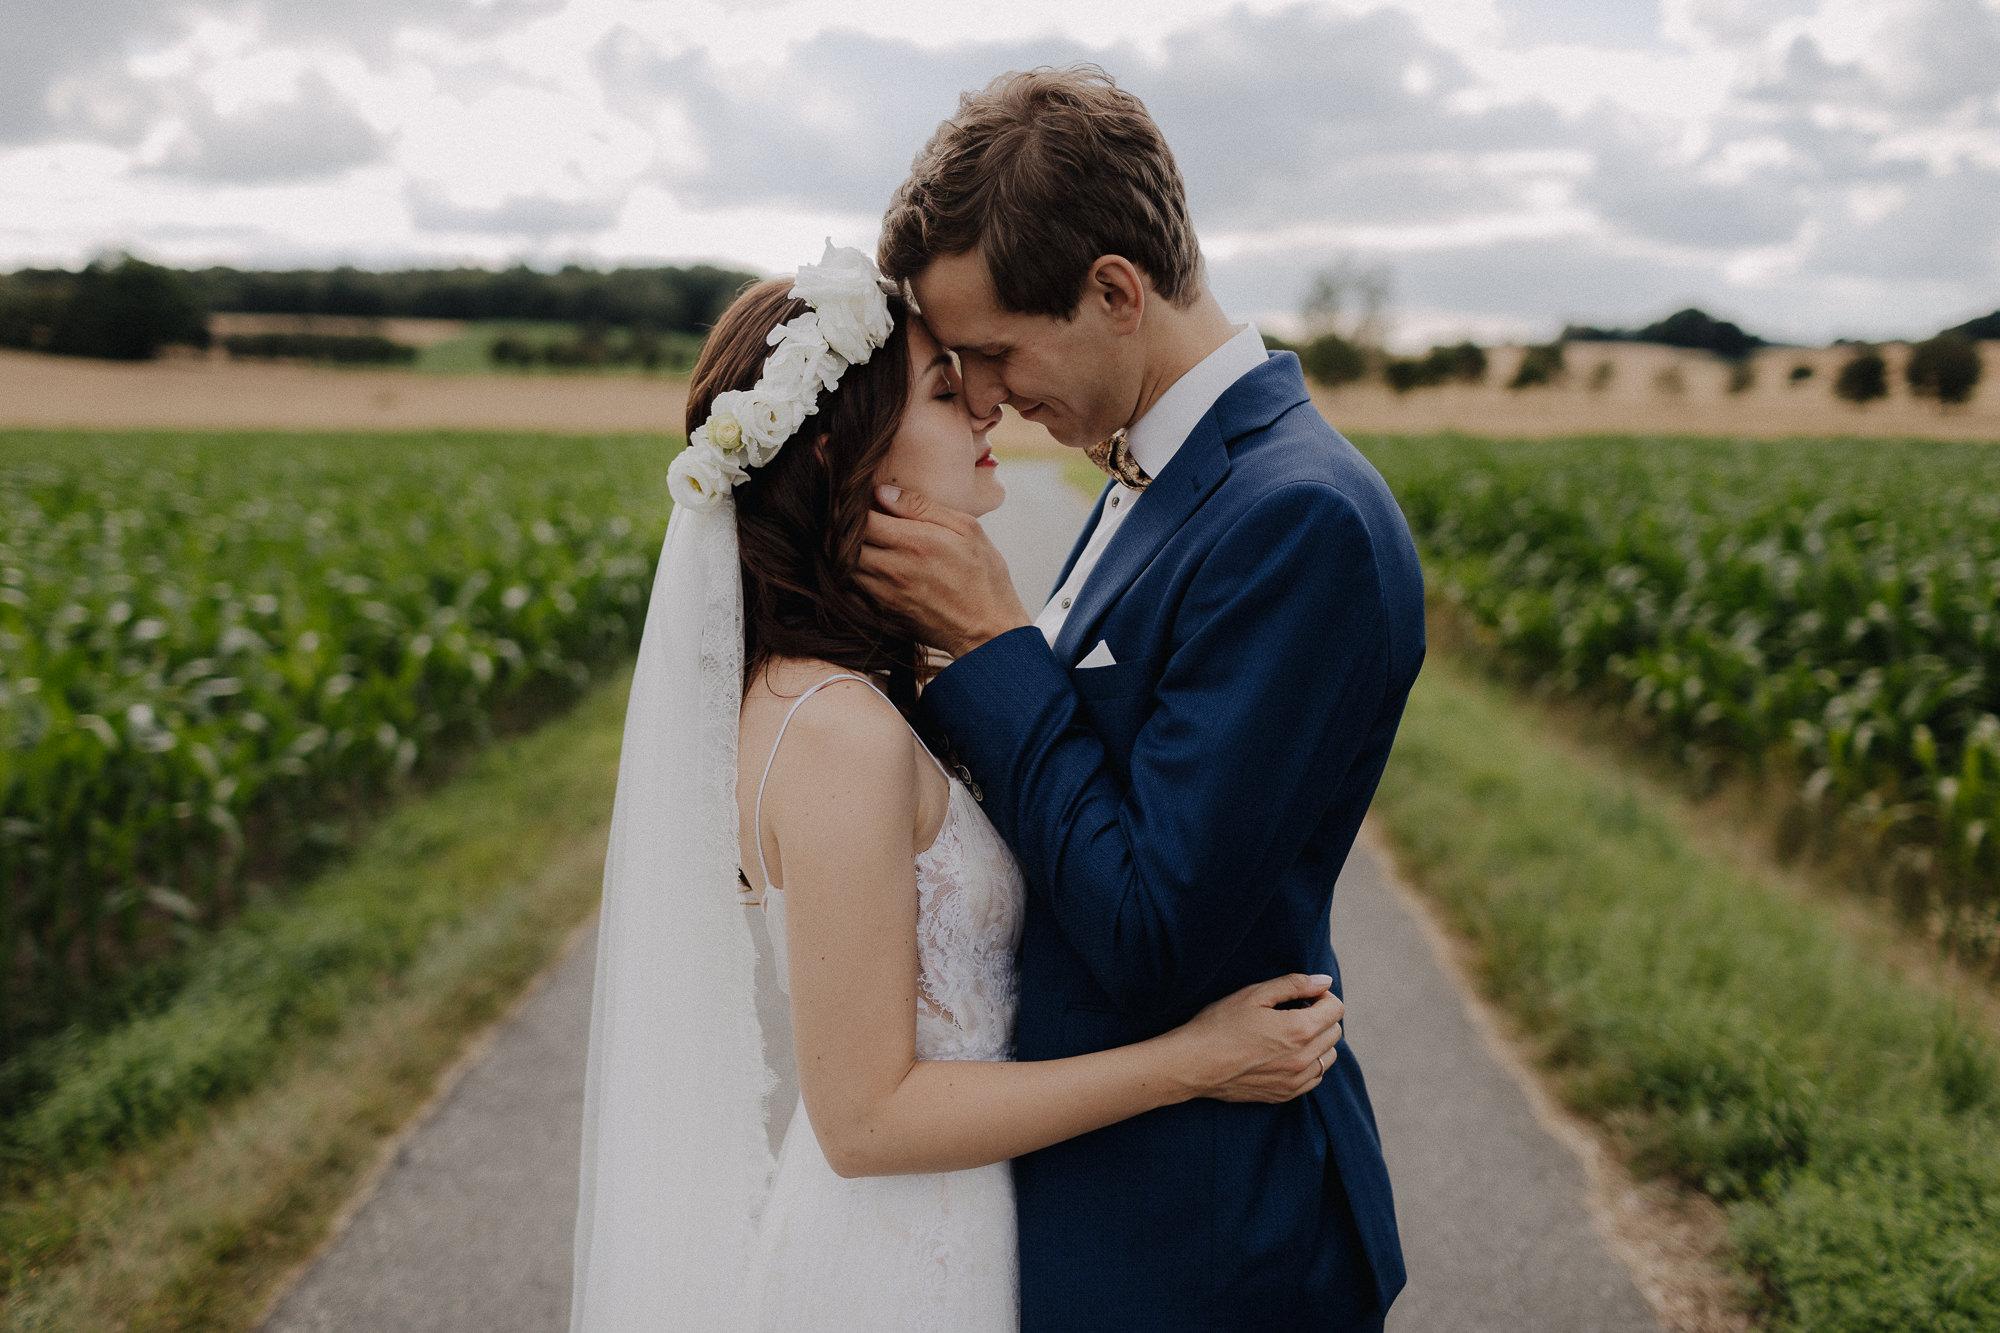 Hochzeitsfotograf-Potsdam-Tom-und-Lia-Fotografie-5DT_0196